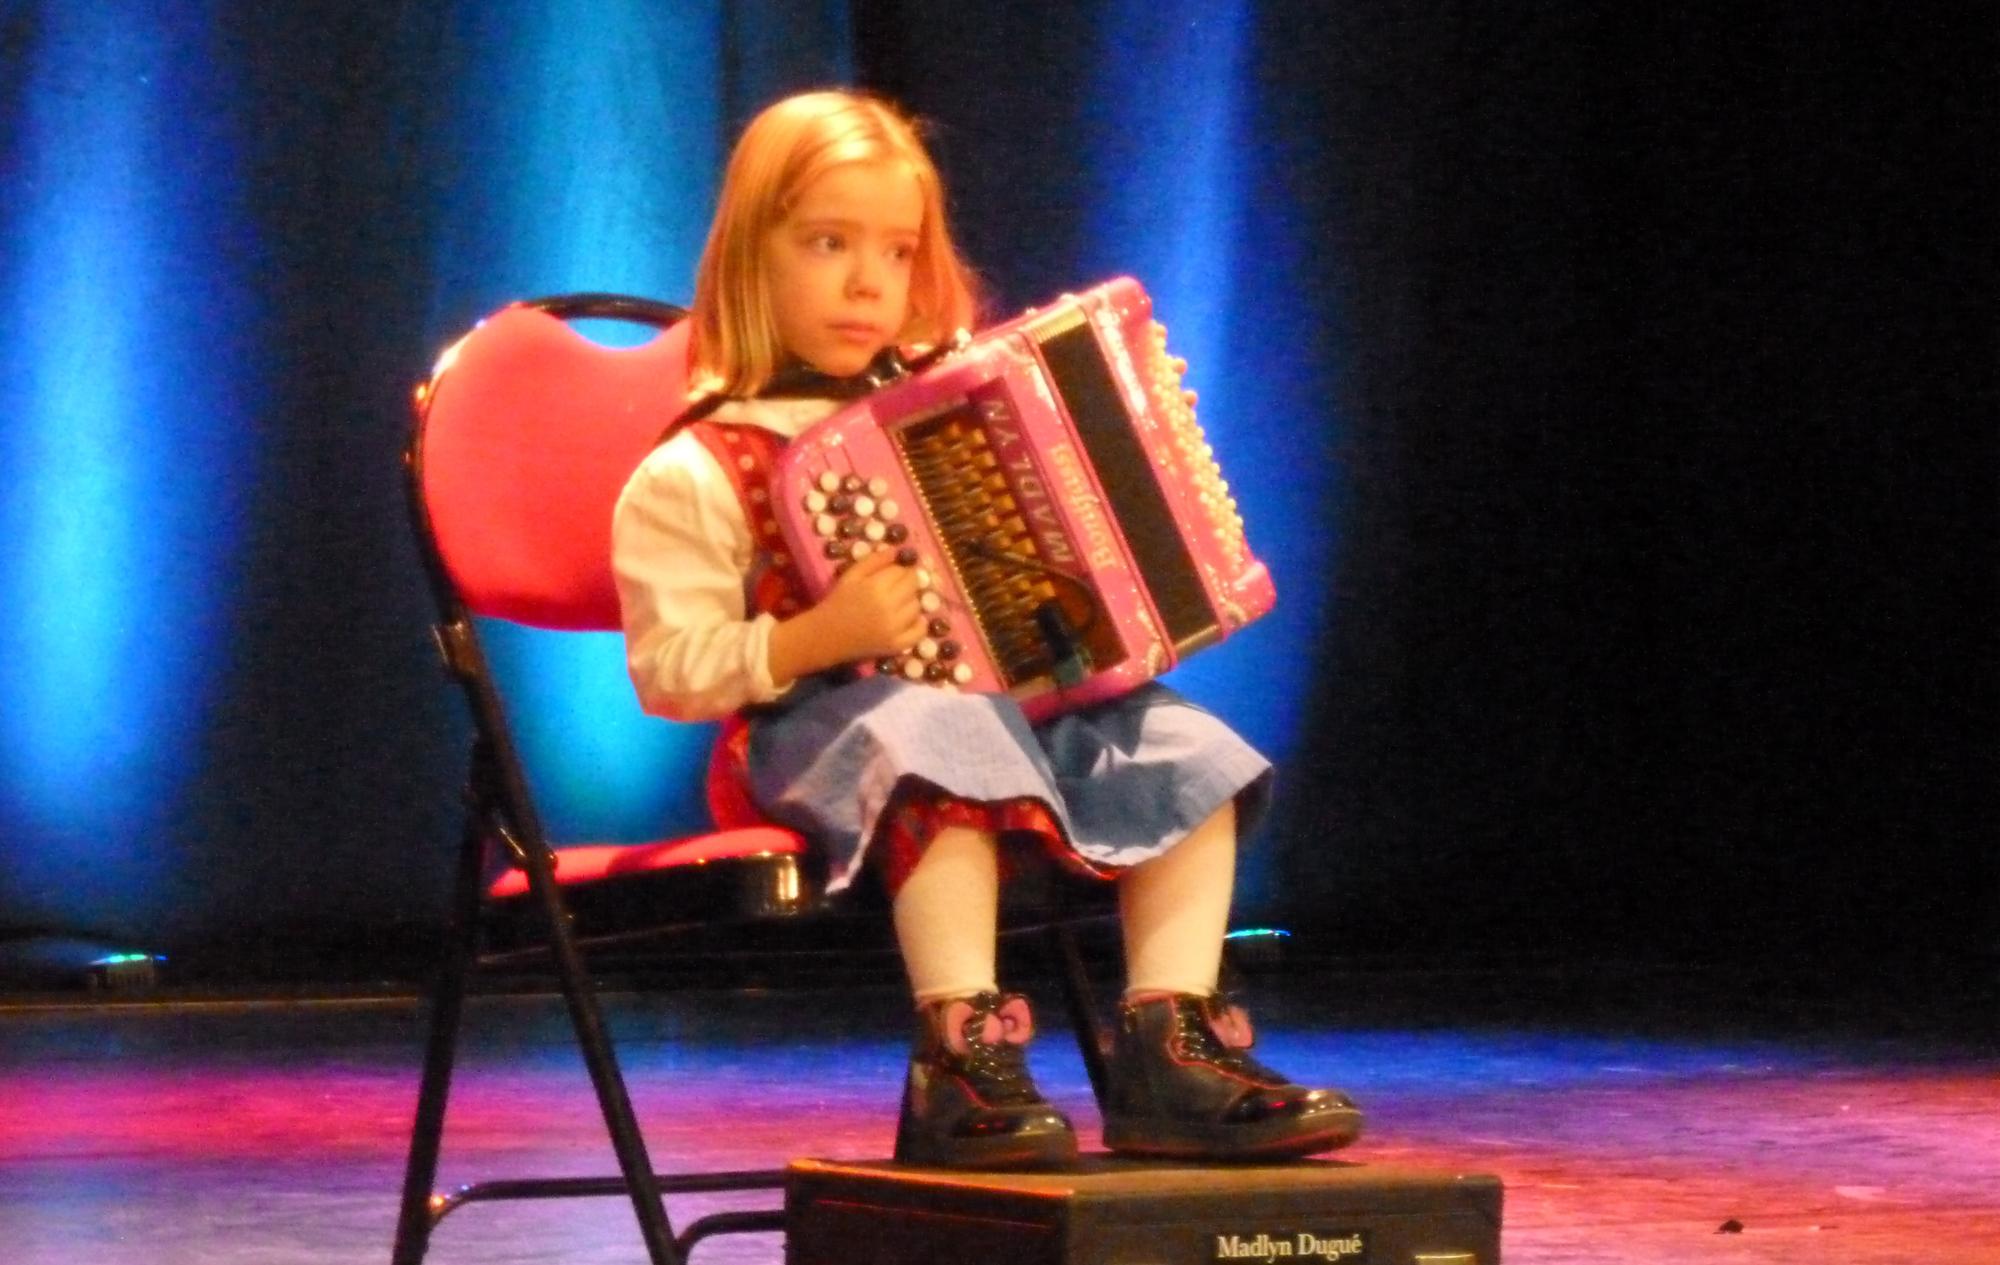 9--Madlyn-accordéon-en-public-à-Villabé-91